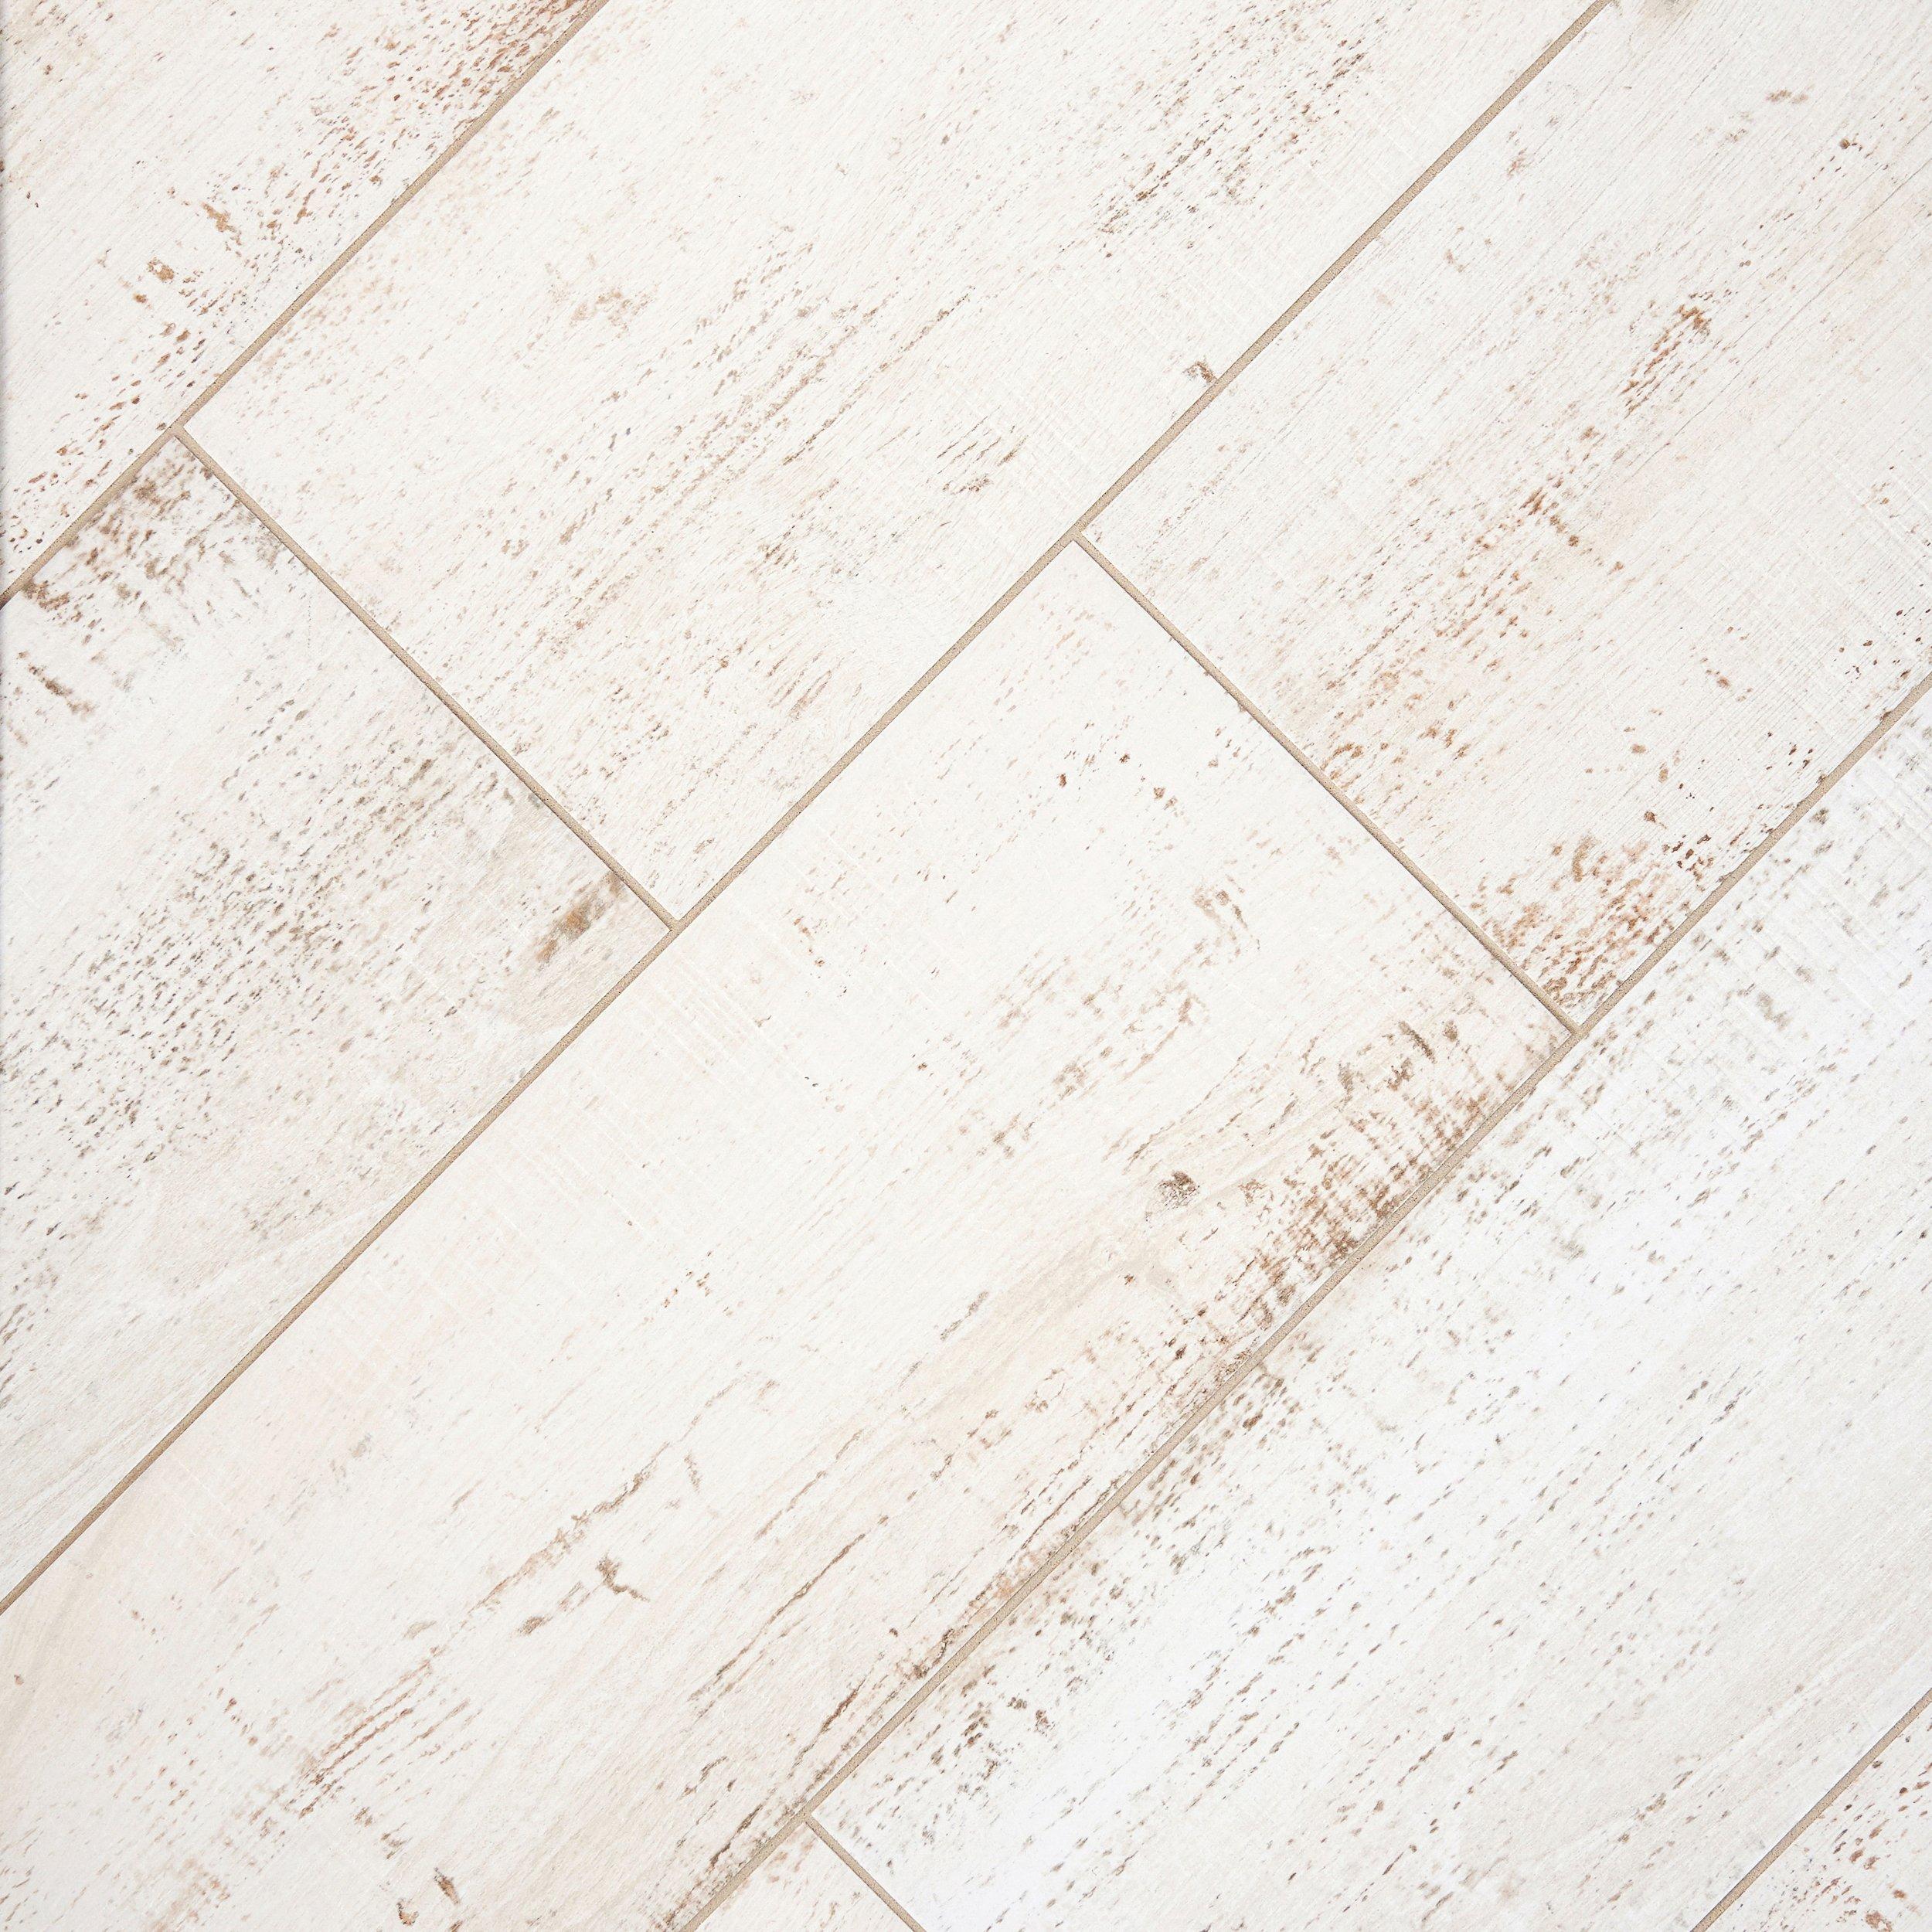 Porcelain Tile Wood Plank: Pier White Wood Plank Porcelain Tile